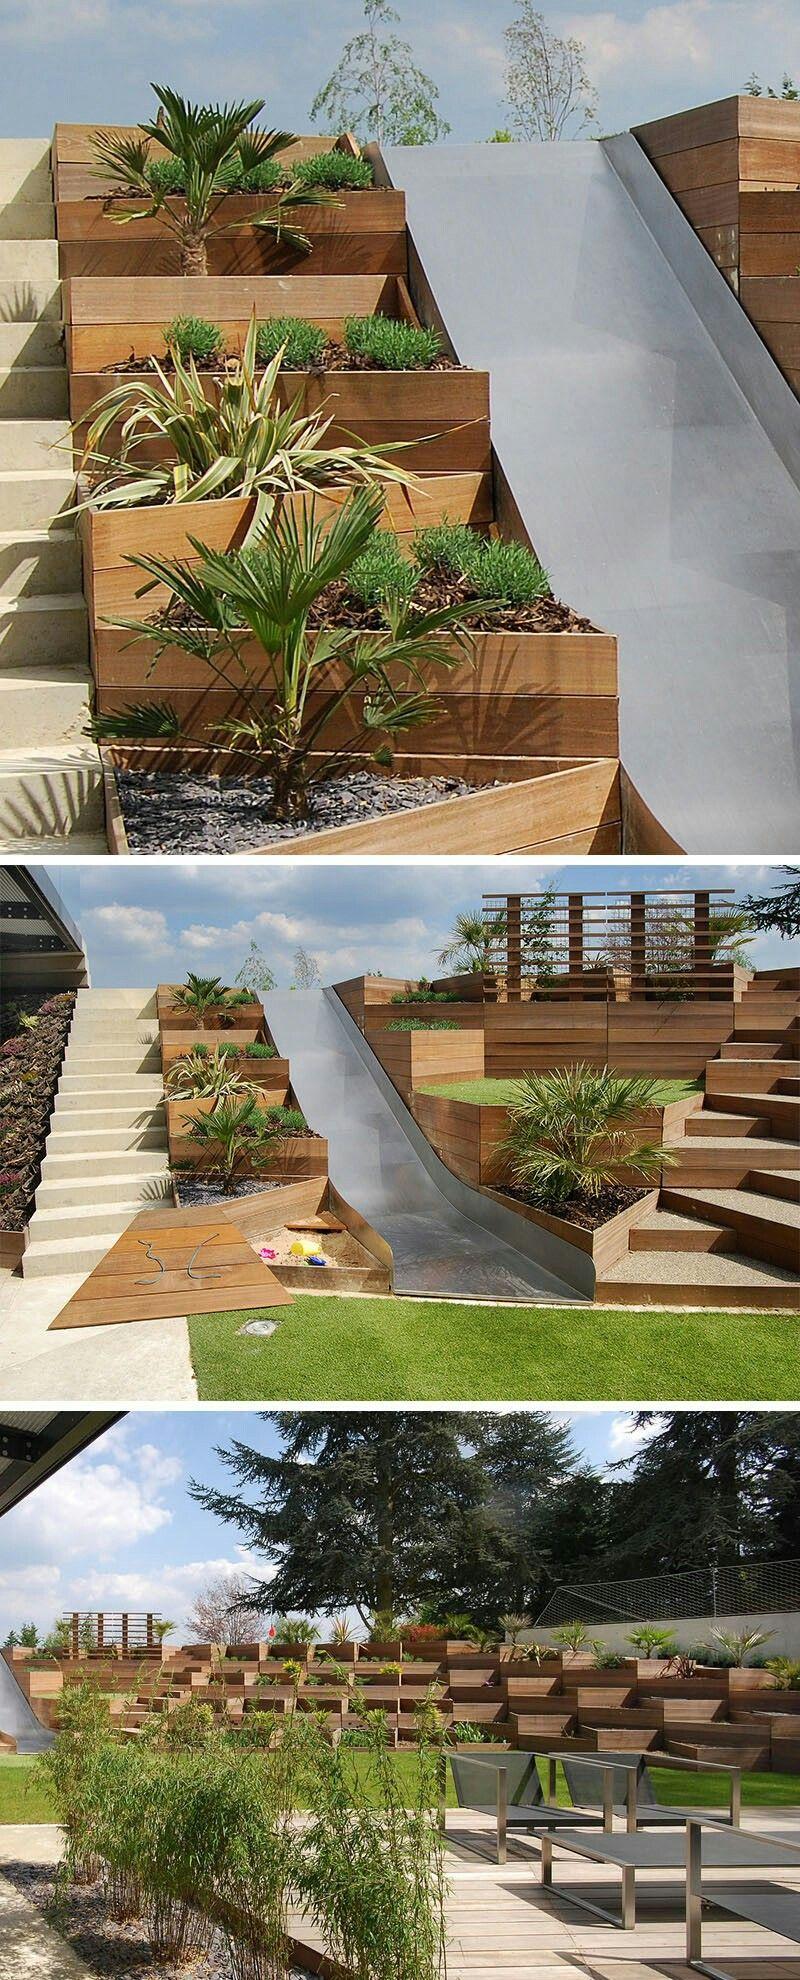 Pin by tarnie on outside. | Pinterest | Garden landscape design ...